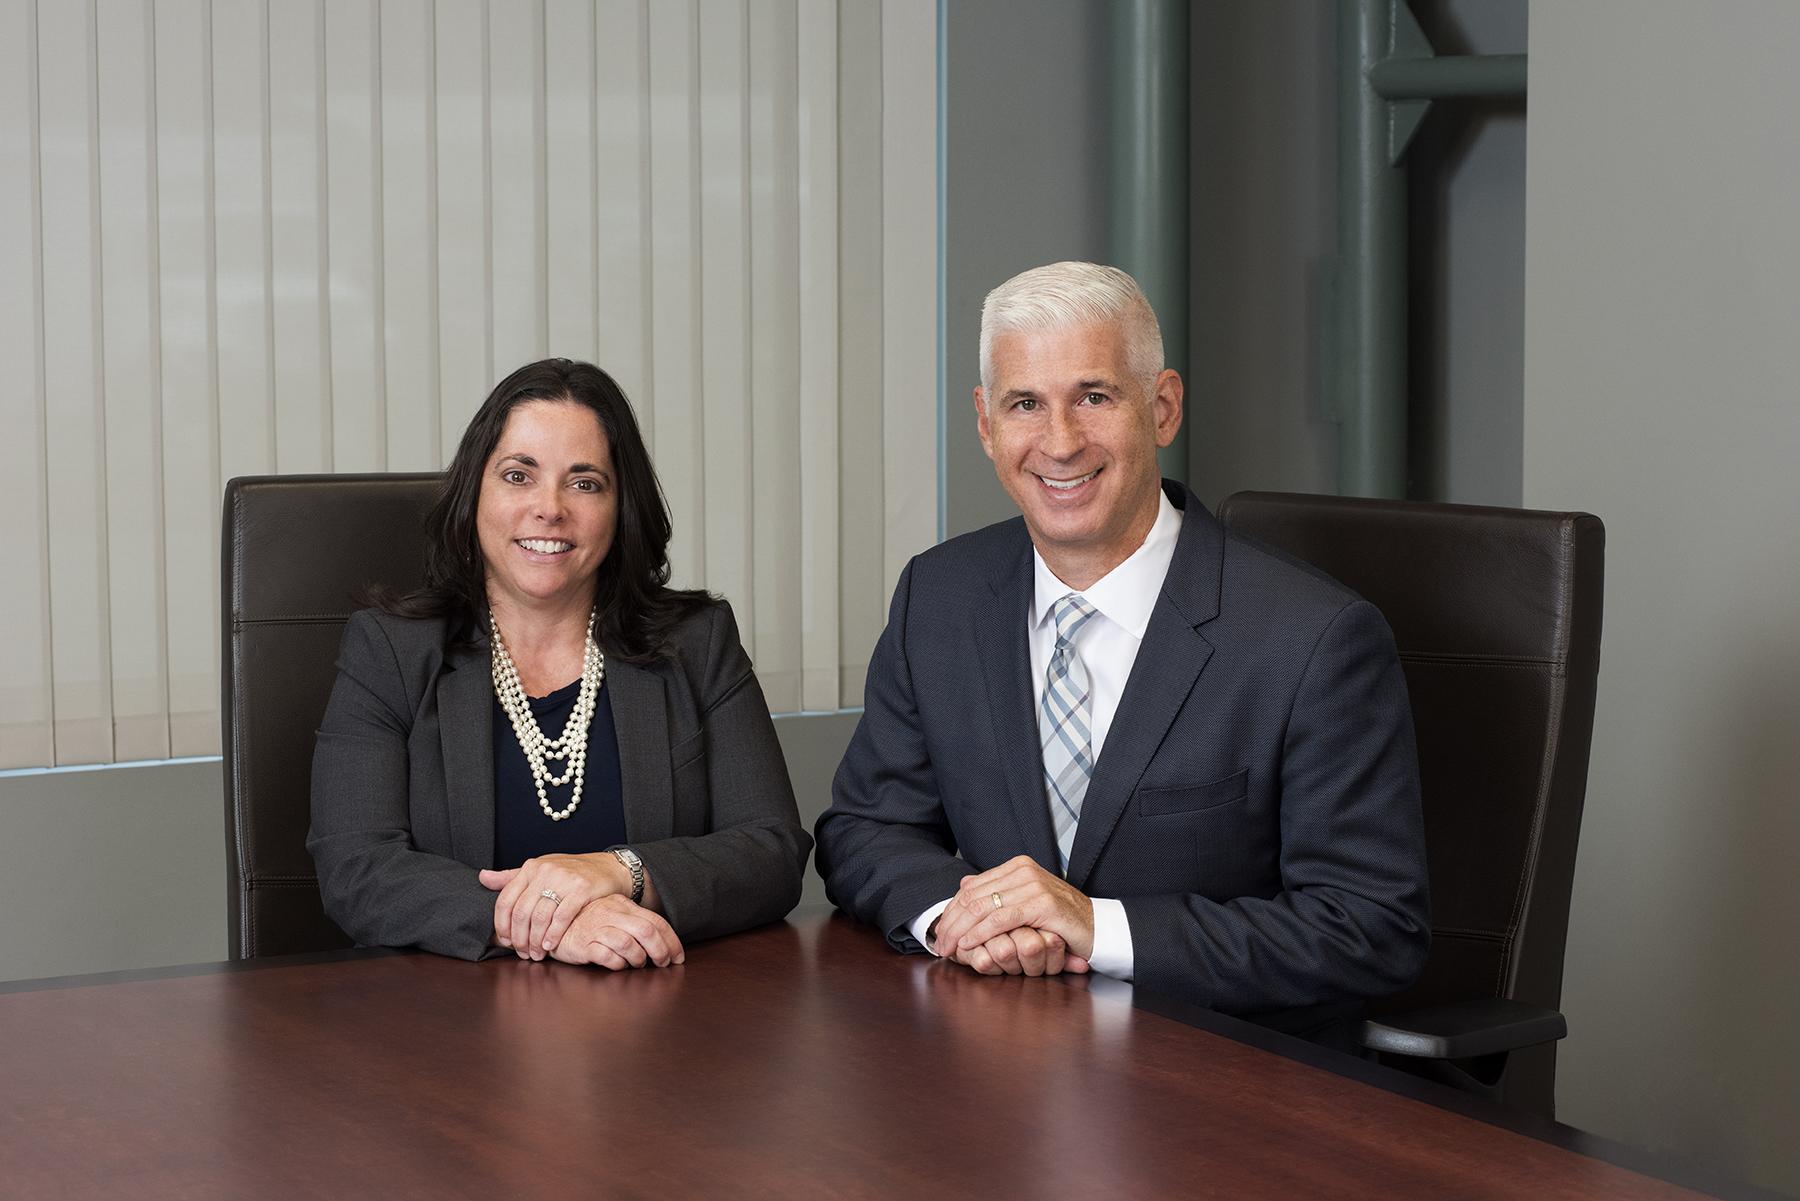 SJ Group Advisors: Jennifer Schrauder and David Jeter